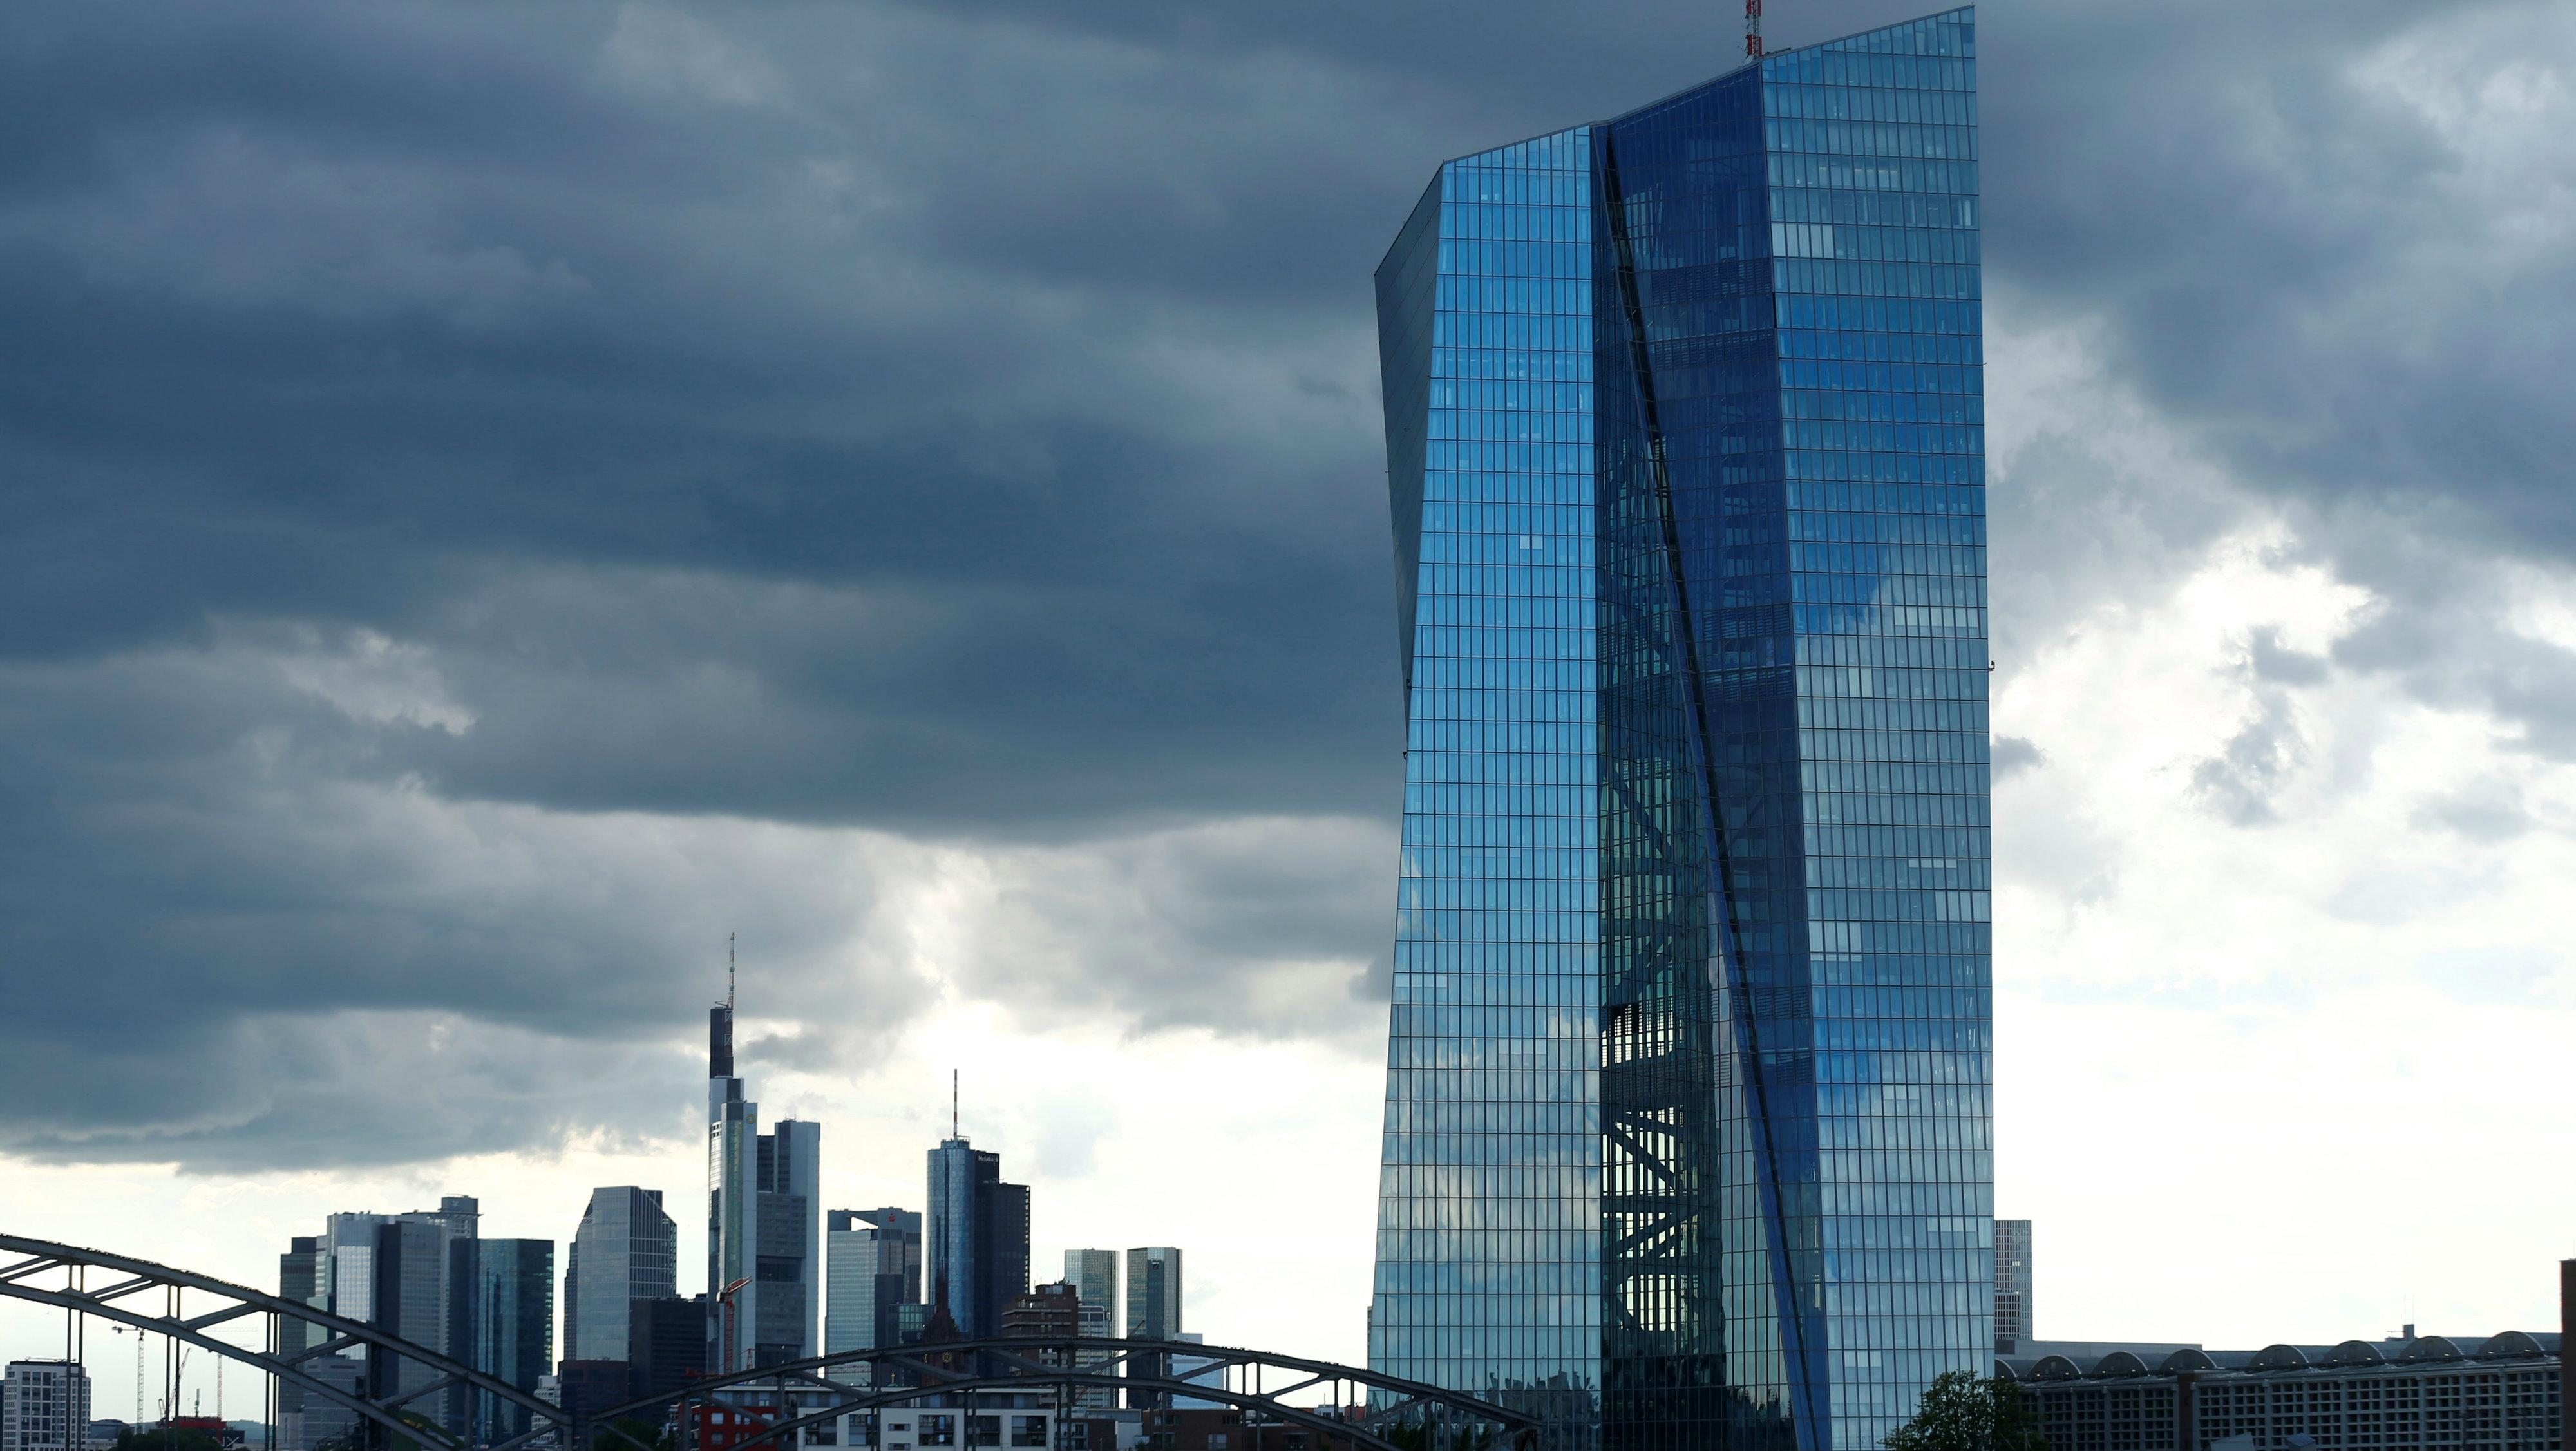 European Central Bank (ECB) headquarters in Frankfur